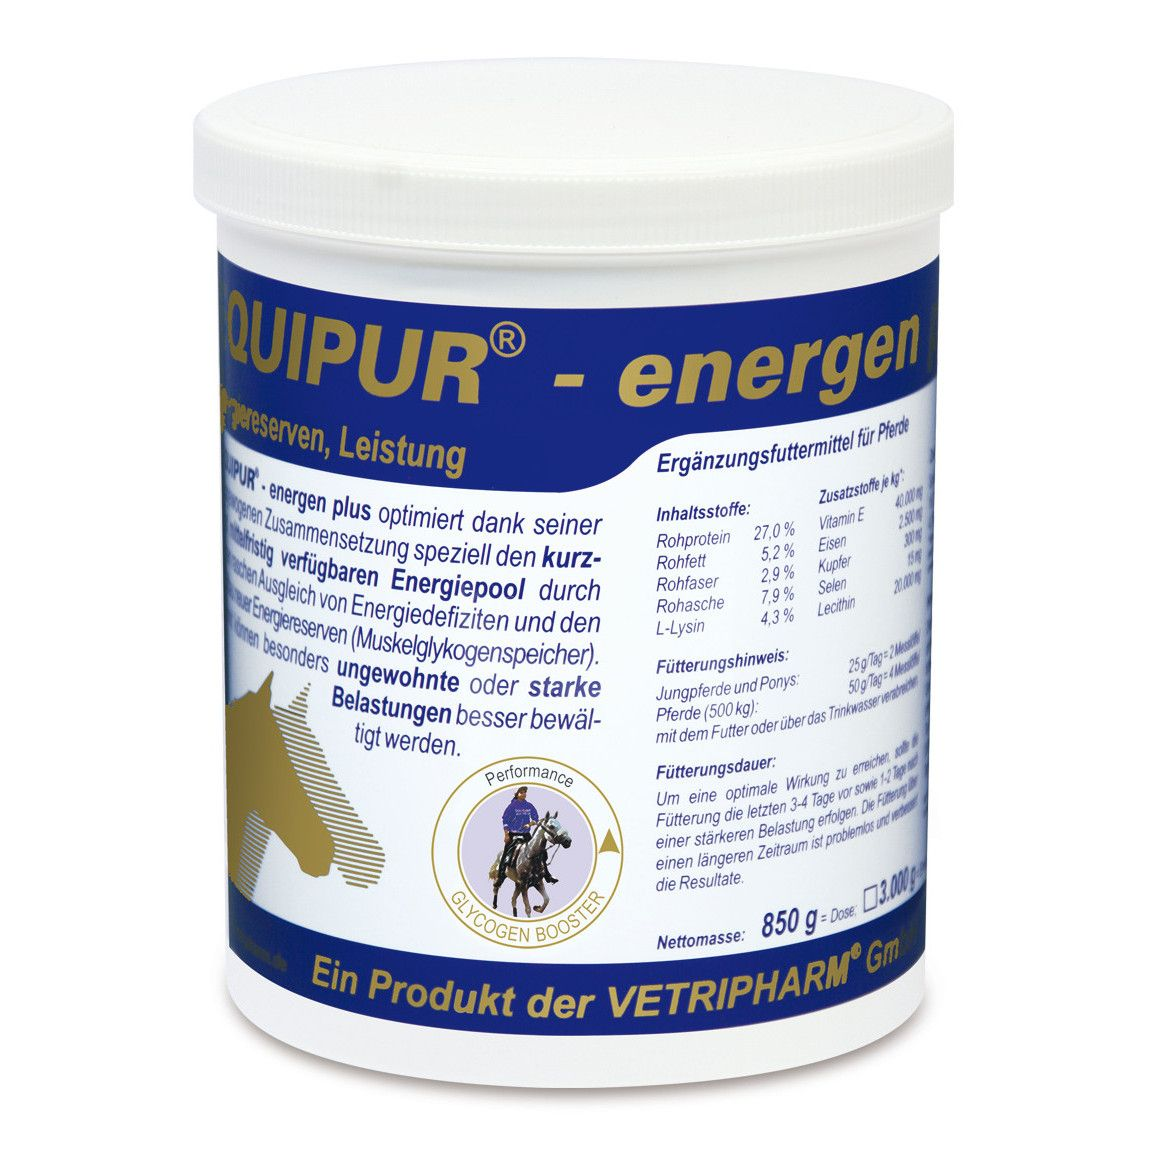 Vetripharm Equipur energen plus